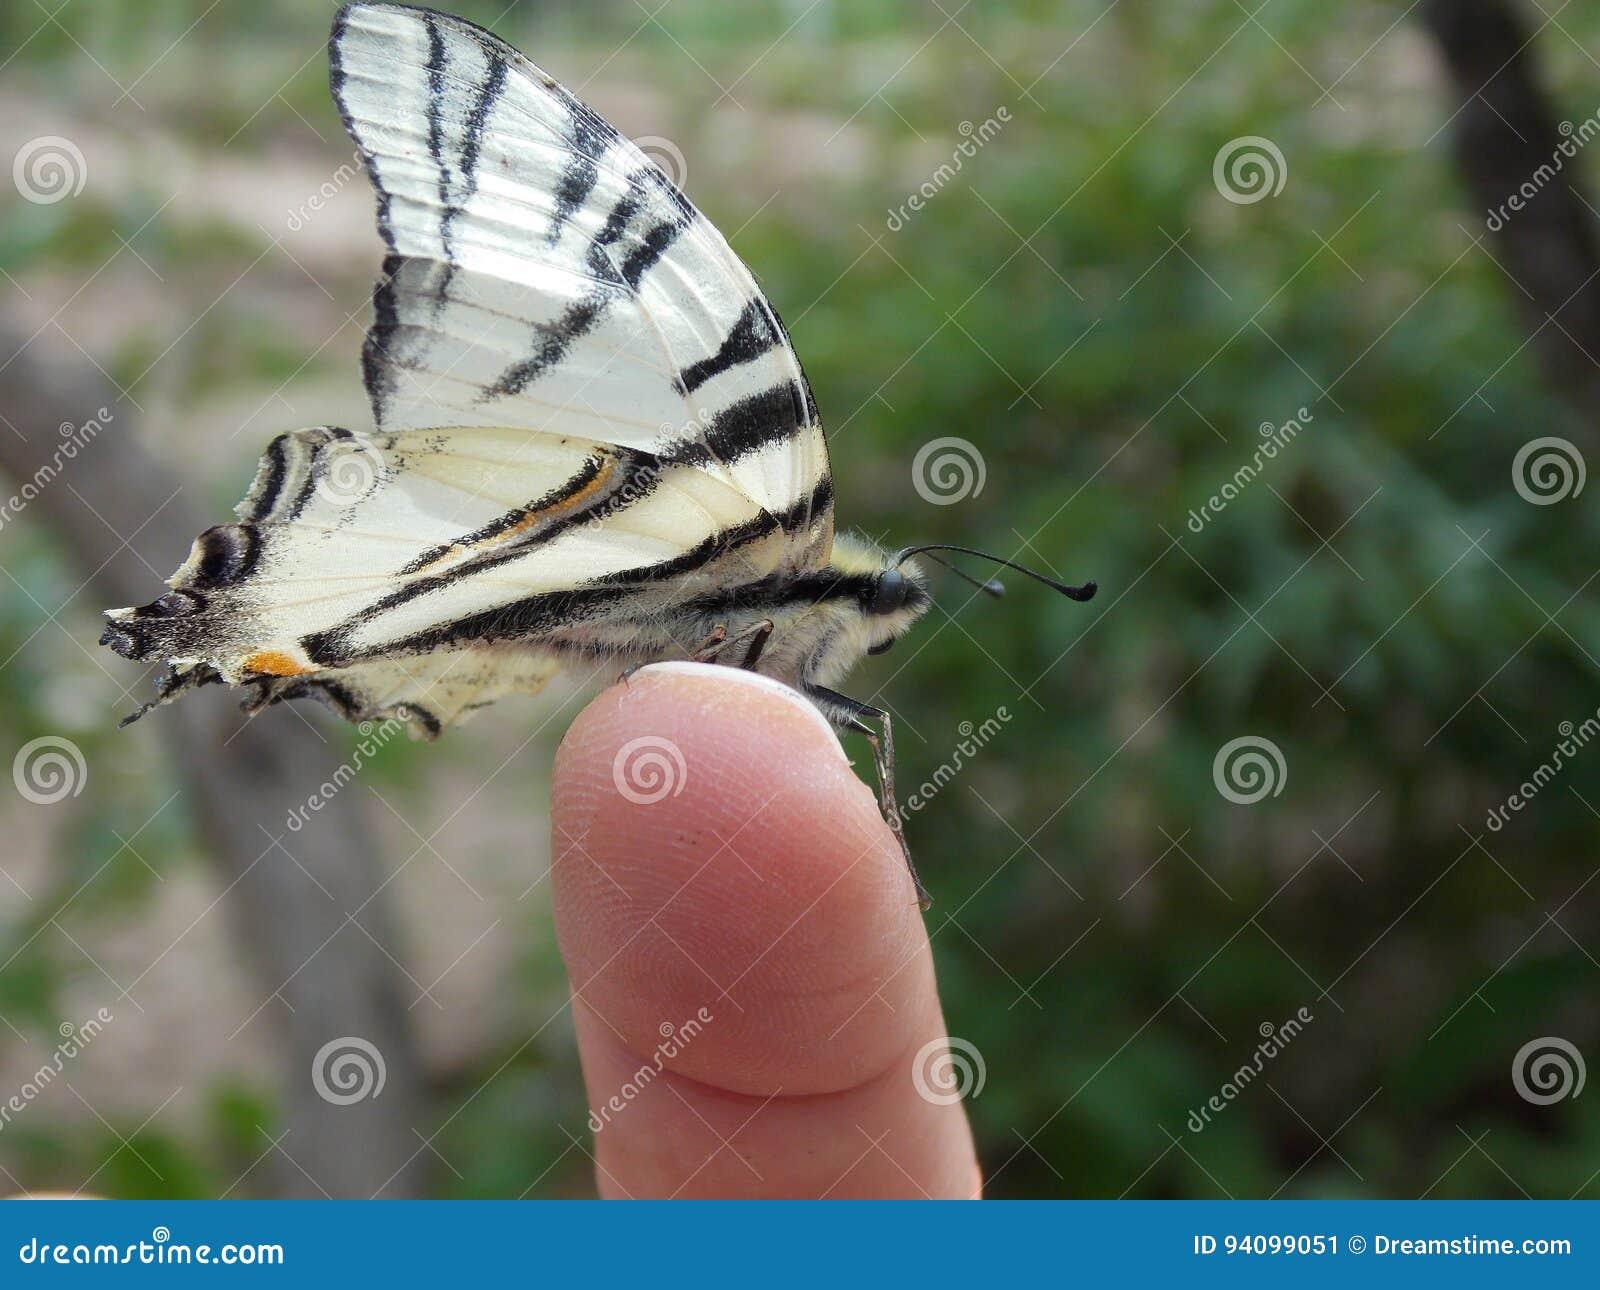 Rzadki swallowtail, podalirius ² Ð ¾ Ñ  Ñ 'Ð ¾ Ð ½ Ð ¾ Ñ  ÐΜÑ † Ð ¿ Ð ¾/Iphiclides/ХРРаР ириР¹